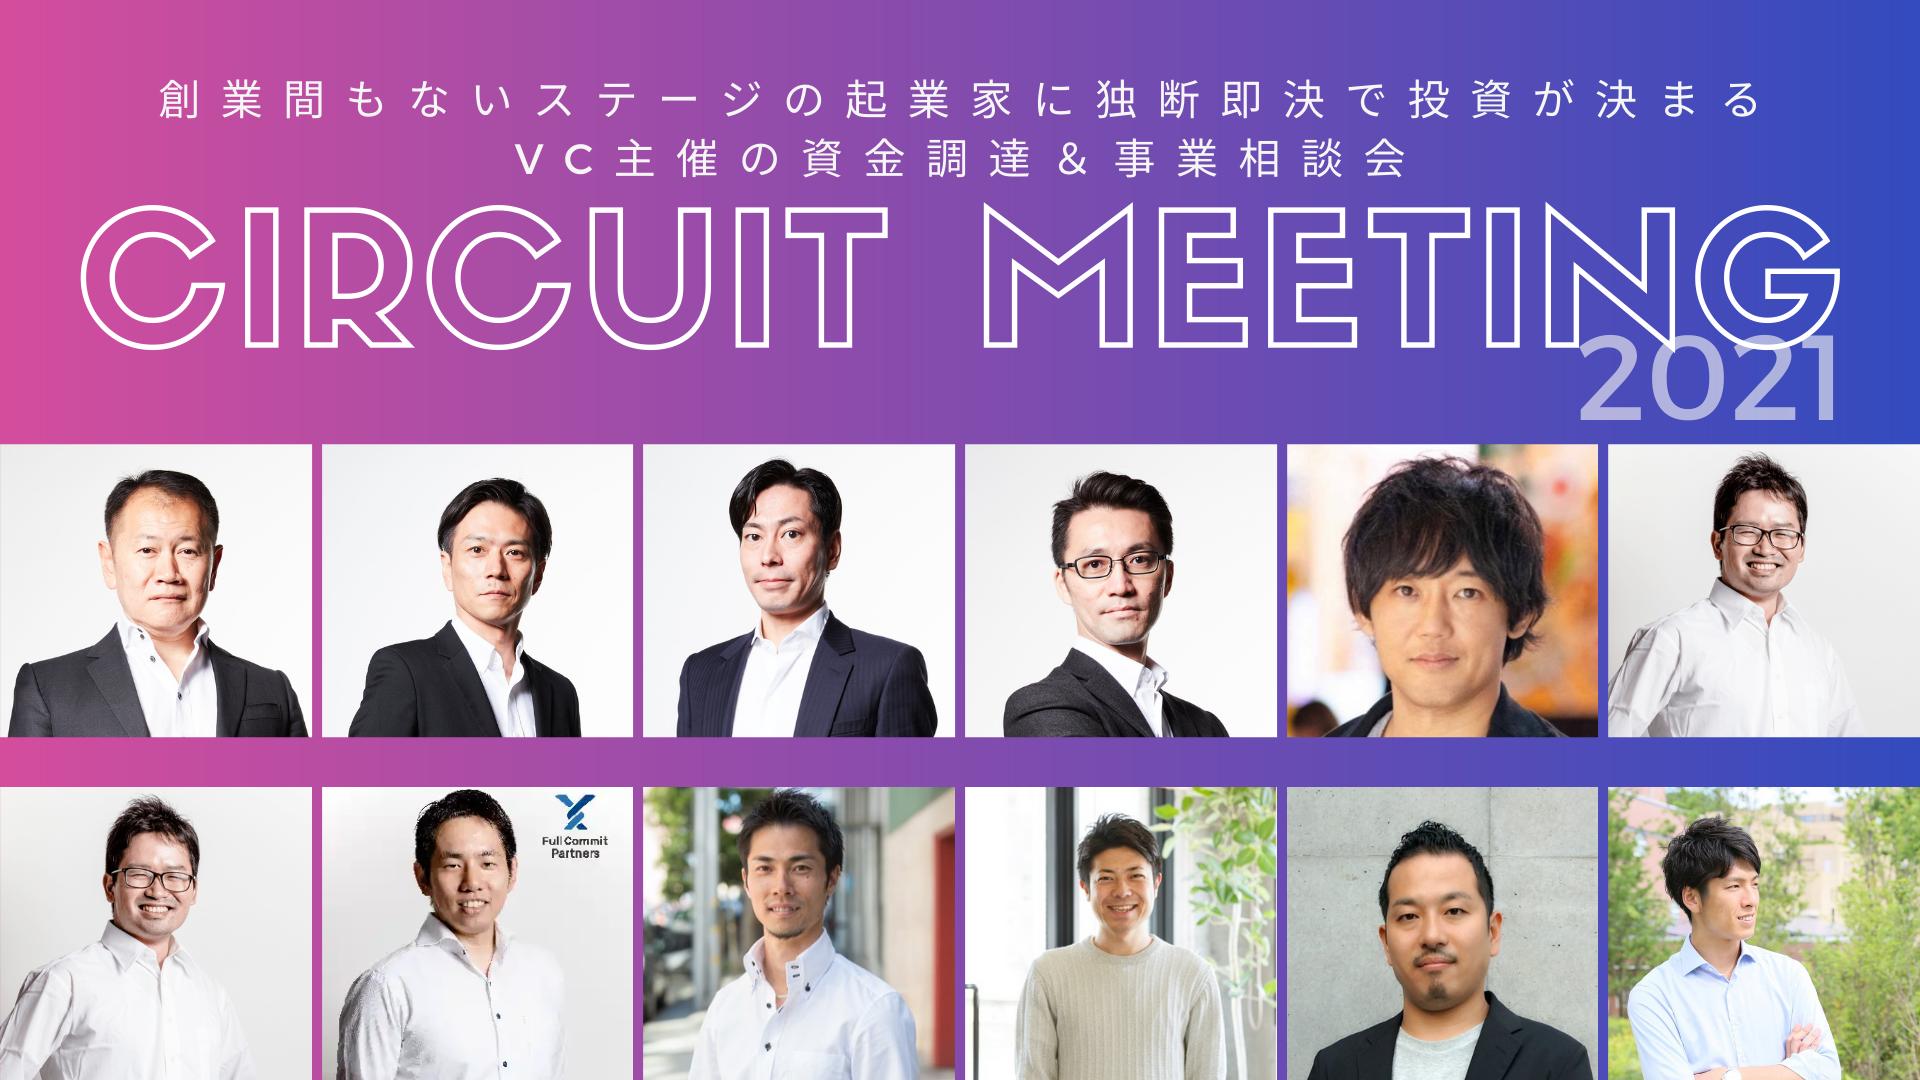 CircuitMeeting